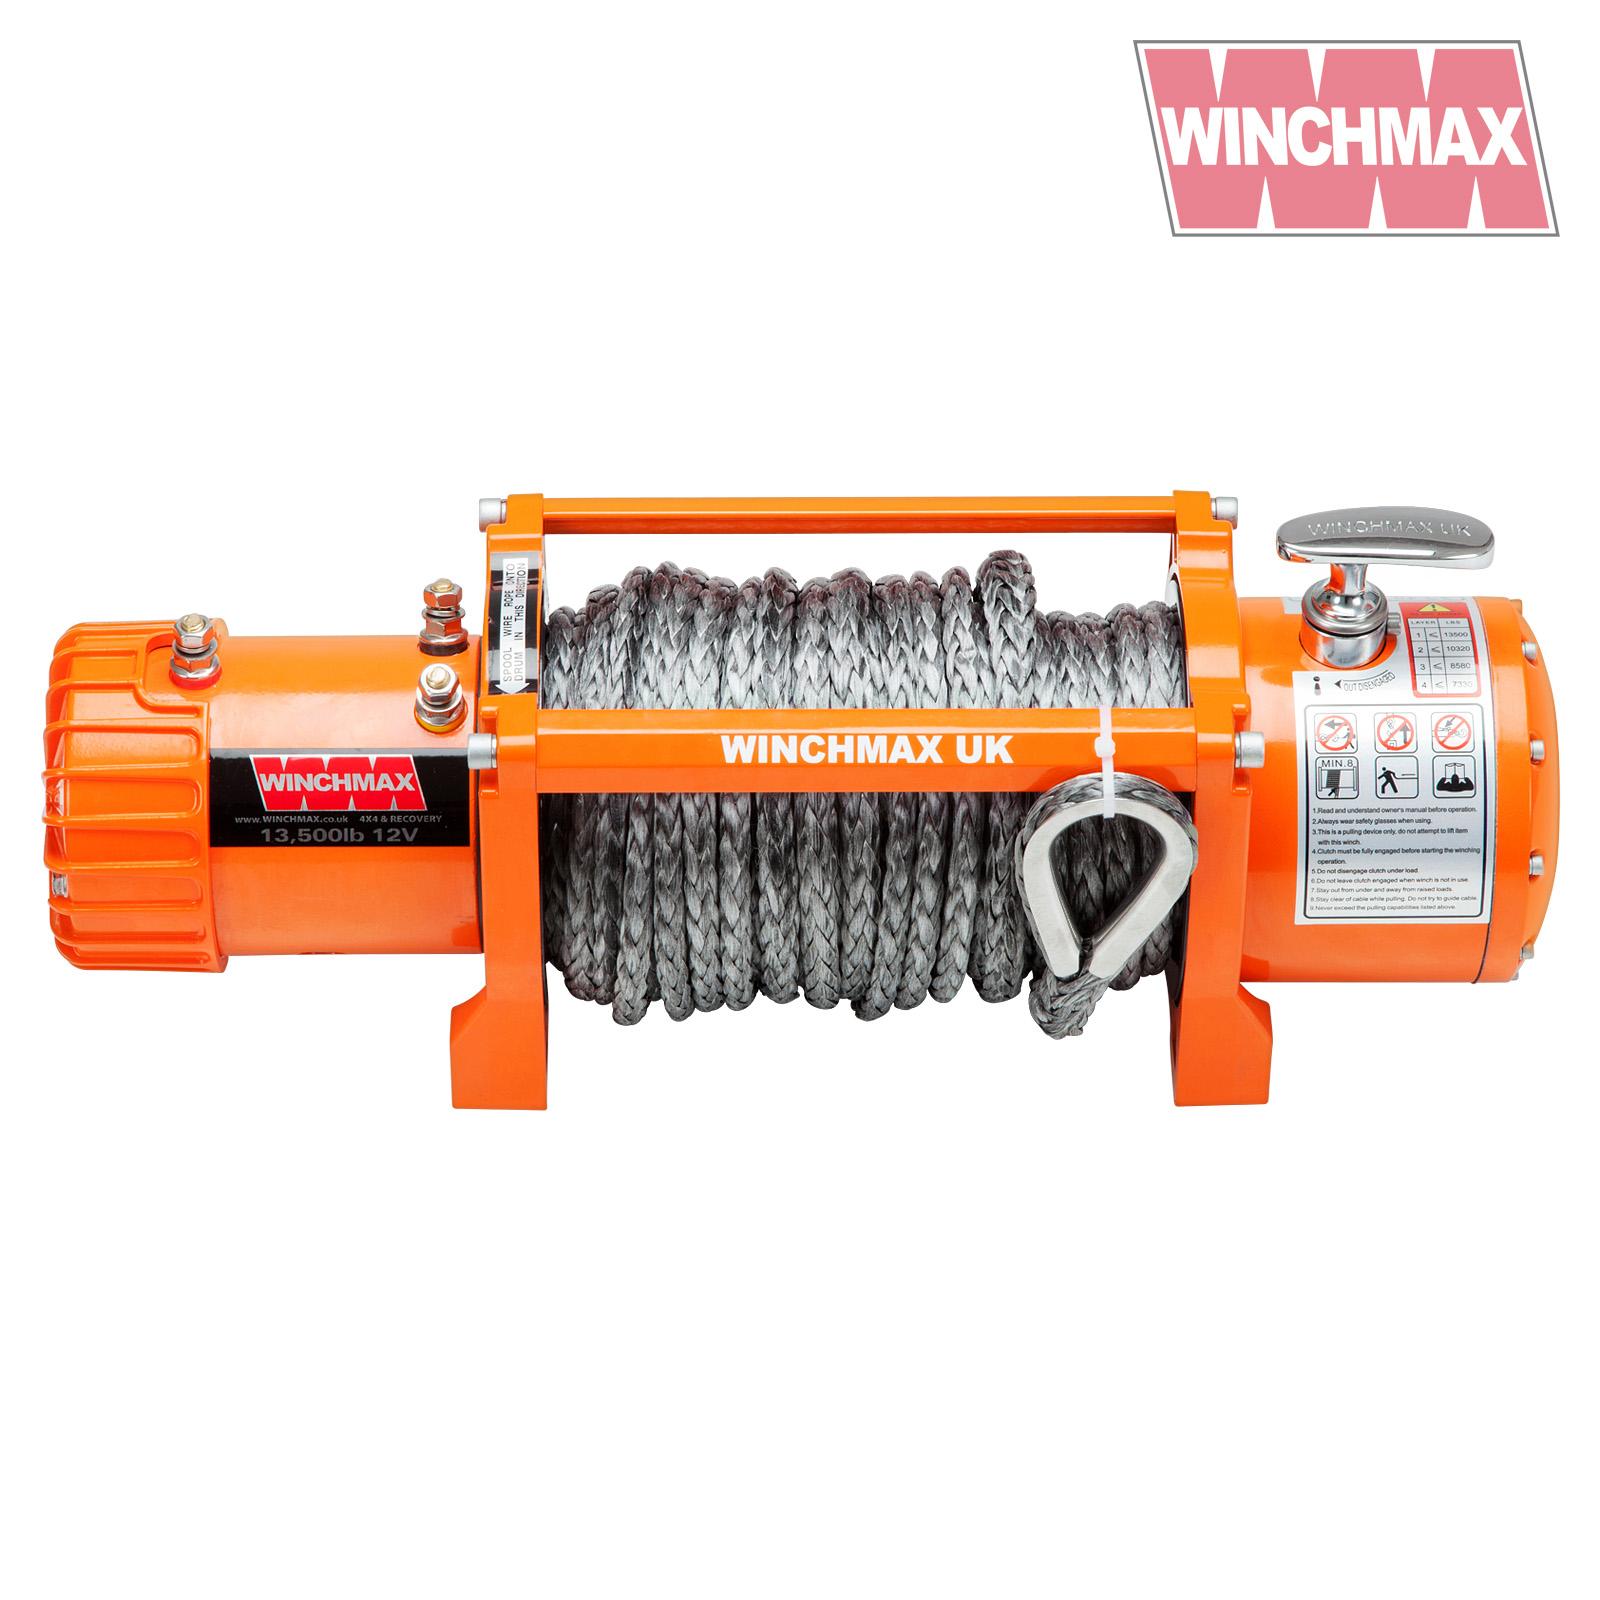 Wm1350012vsyn winchmax 516